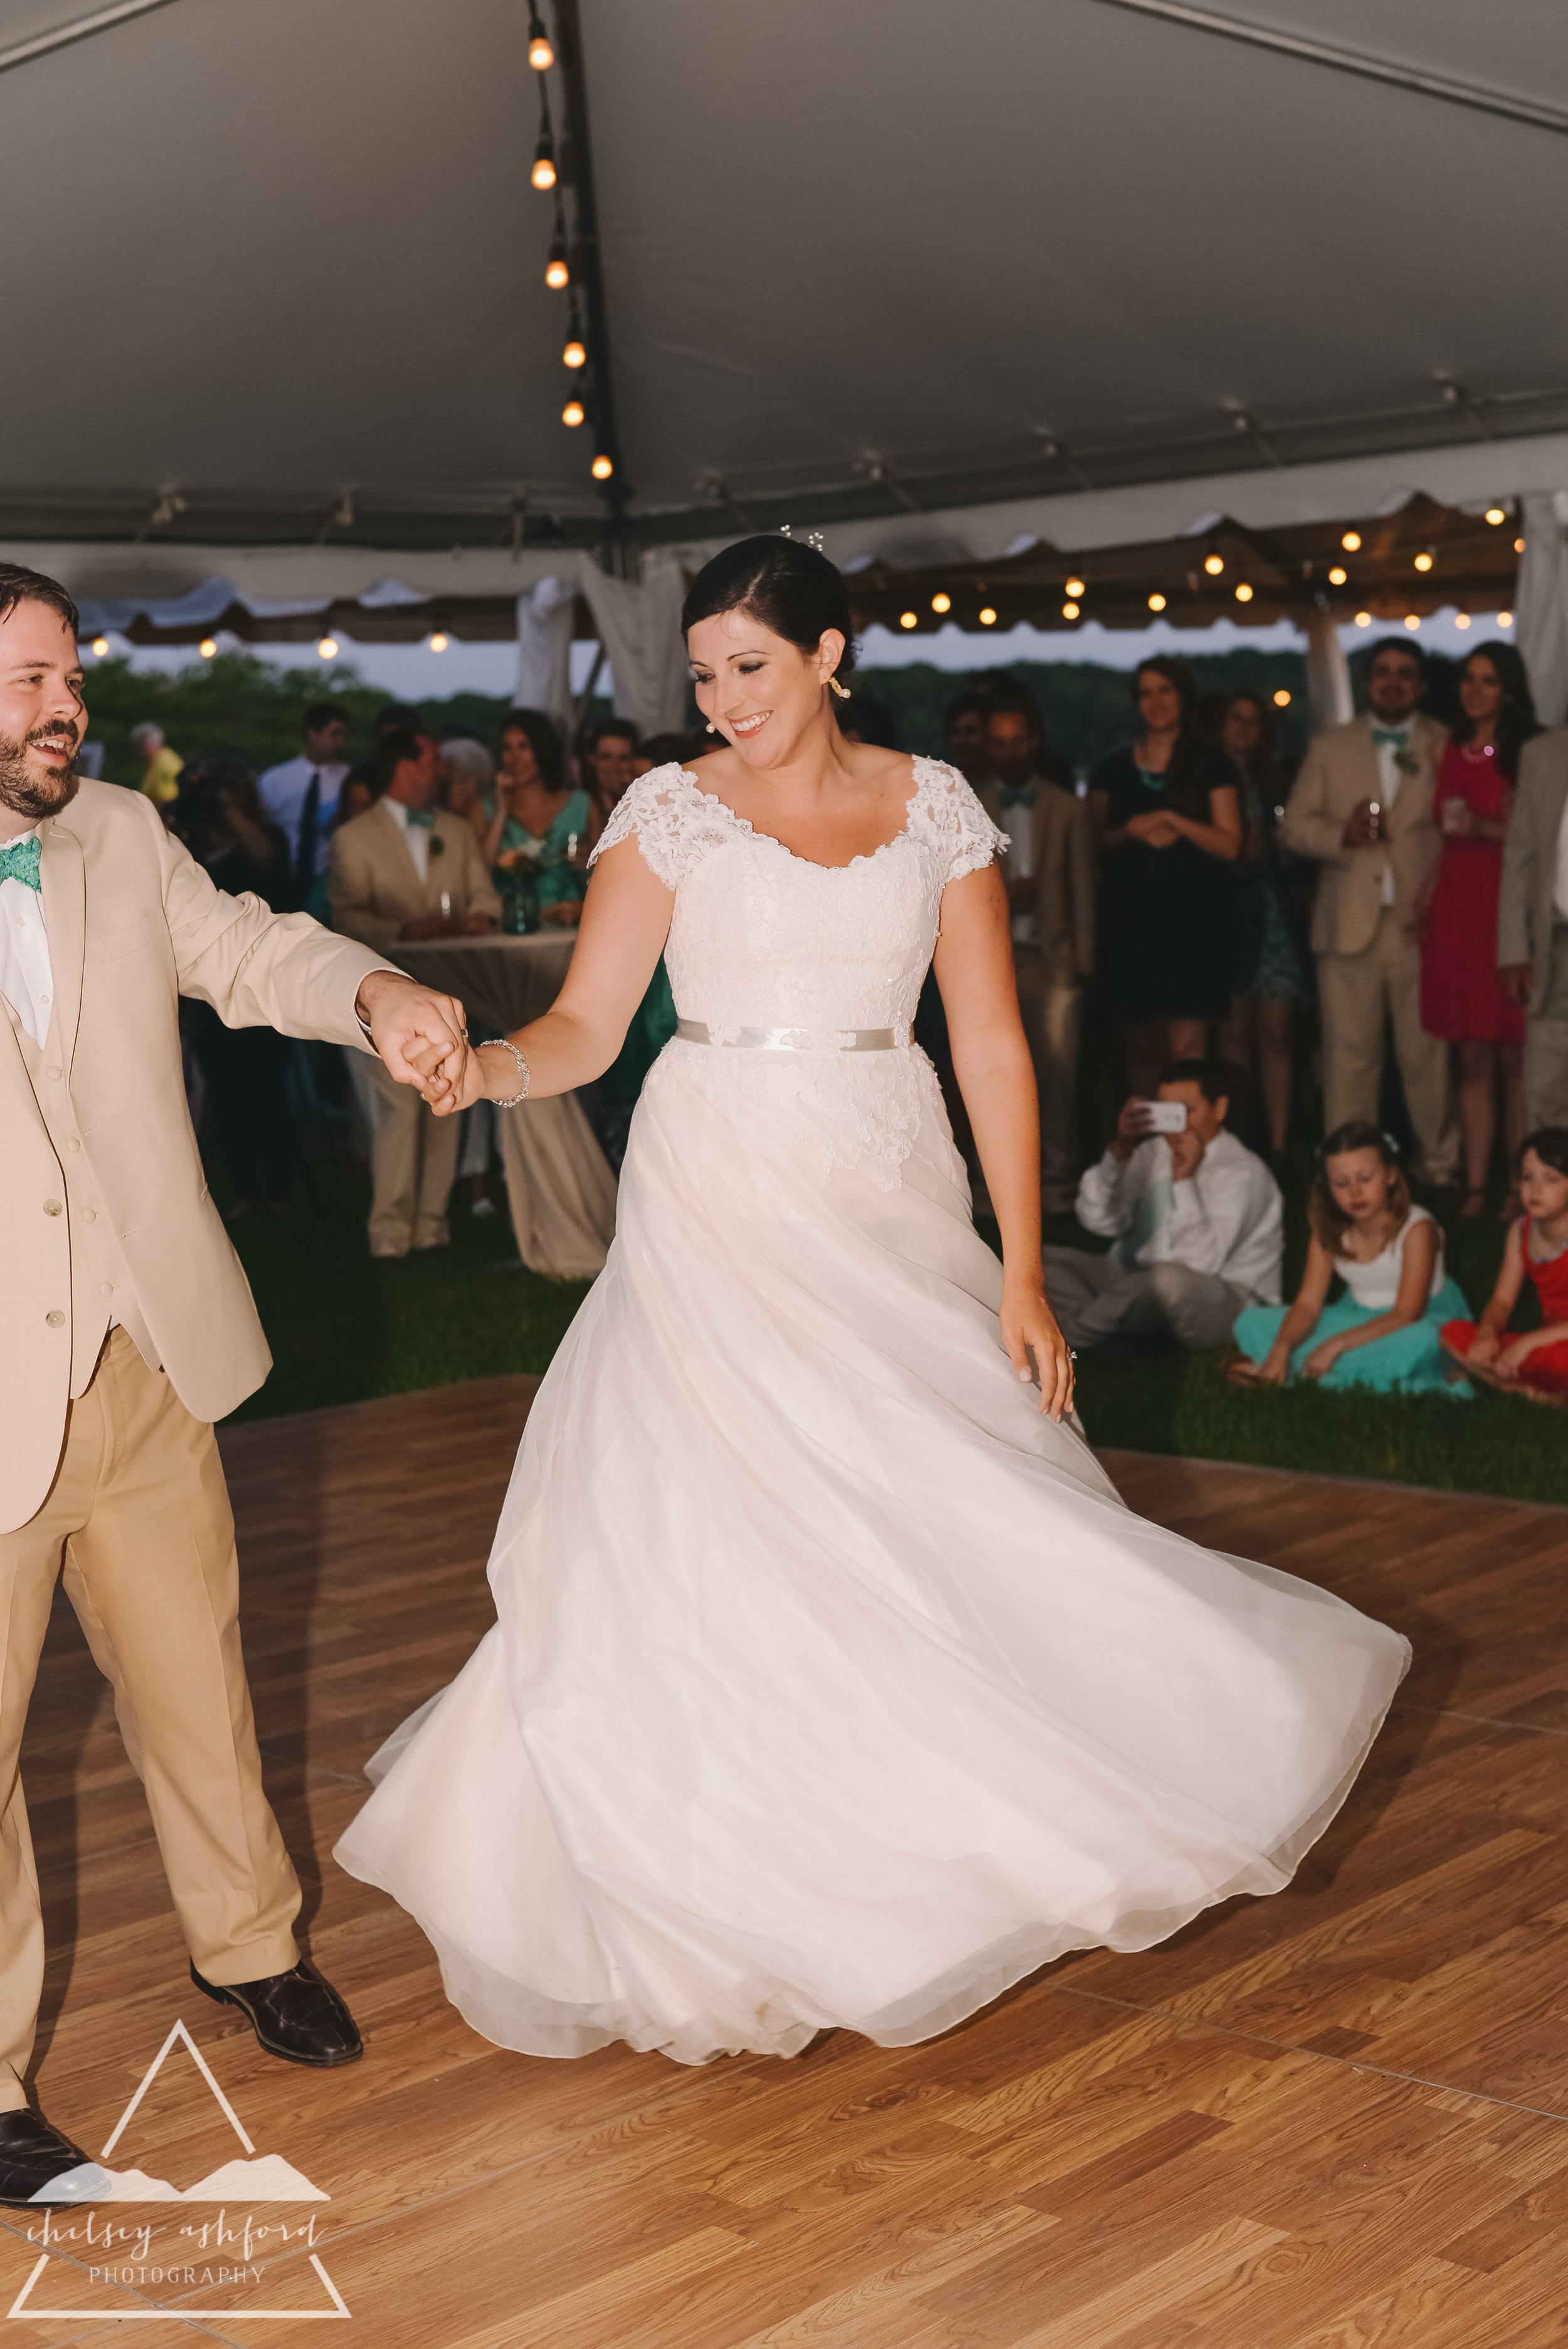 Clarkson_wedding_web-160.jpg